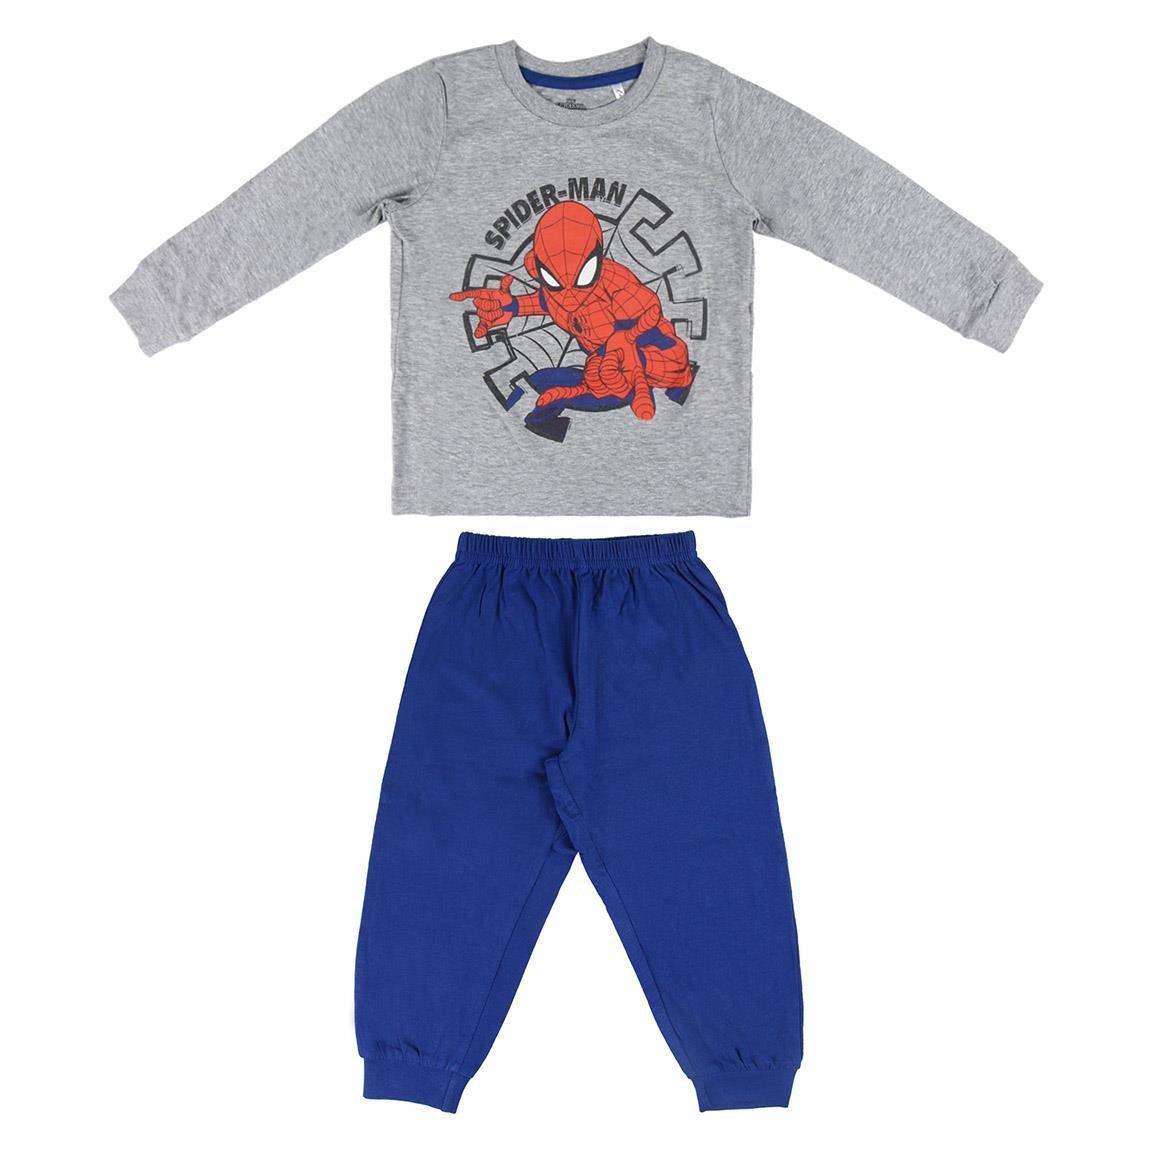 Pijama cu imprimeu central Spiderman, Alb/Albastru